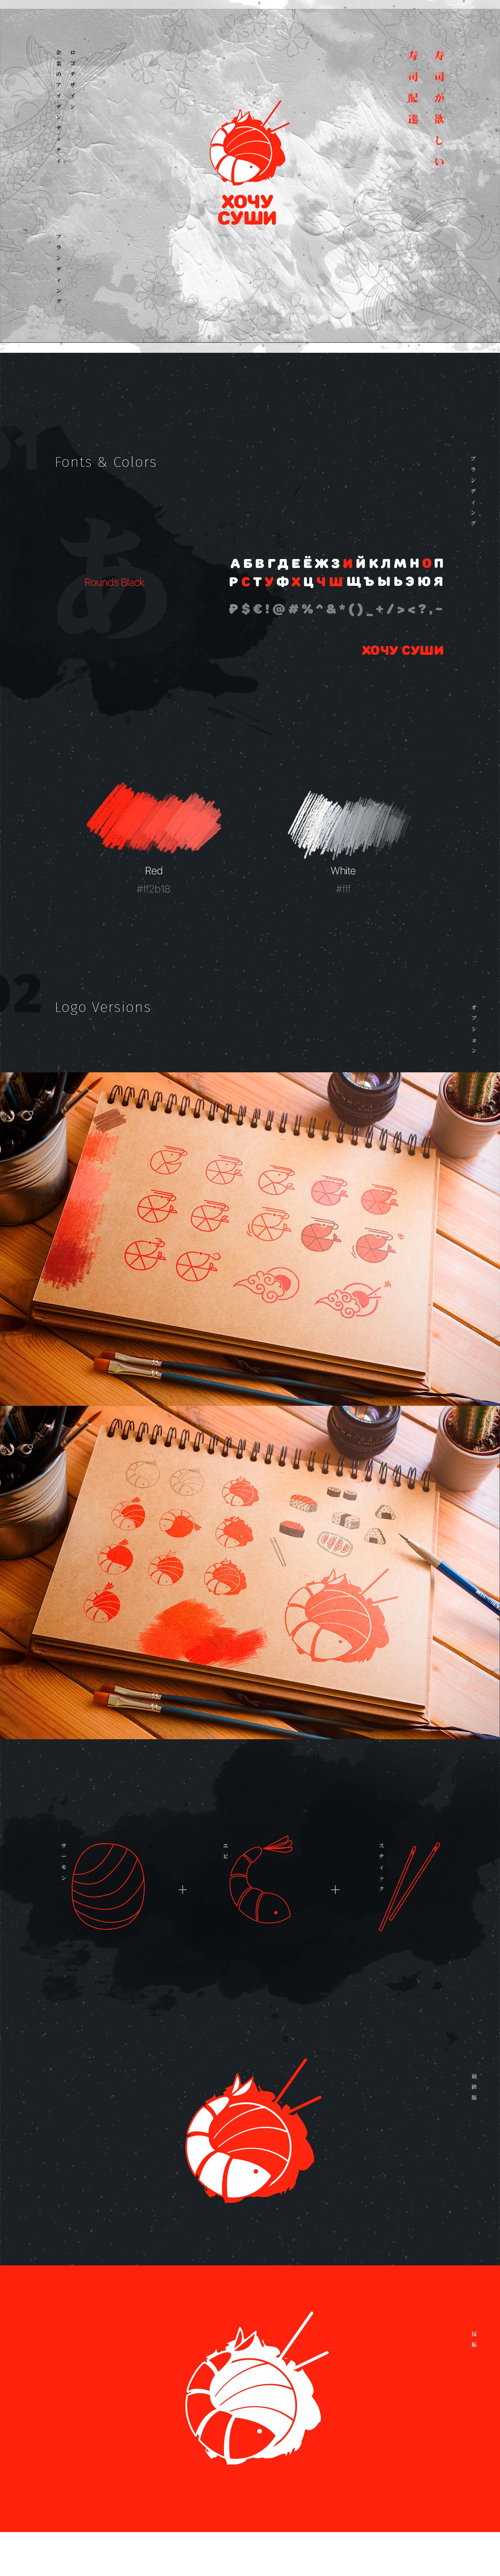 logo Sushi identity branding  brand red shrimp japanese ILLUSTRATION  delivery